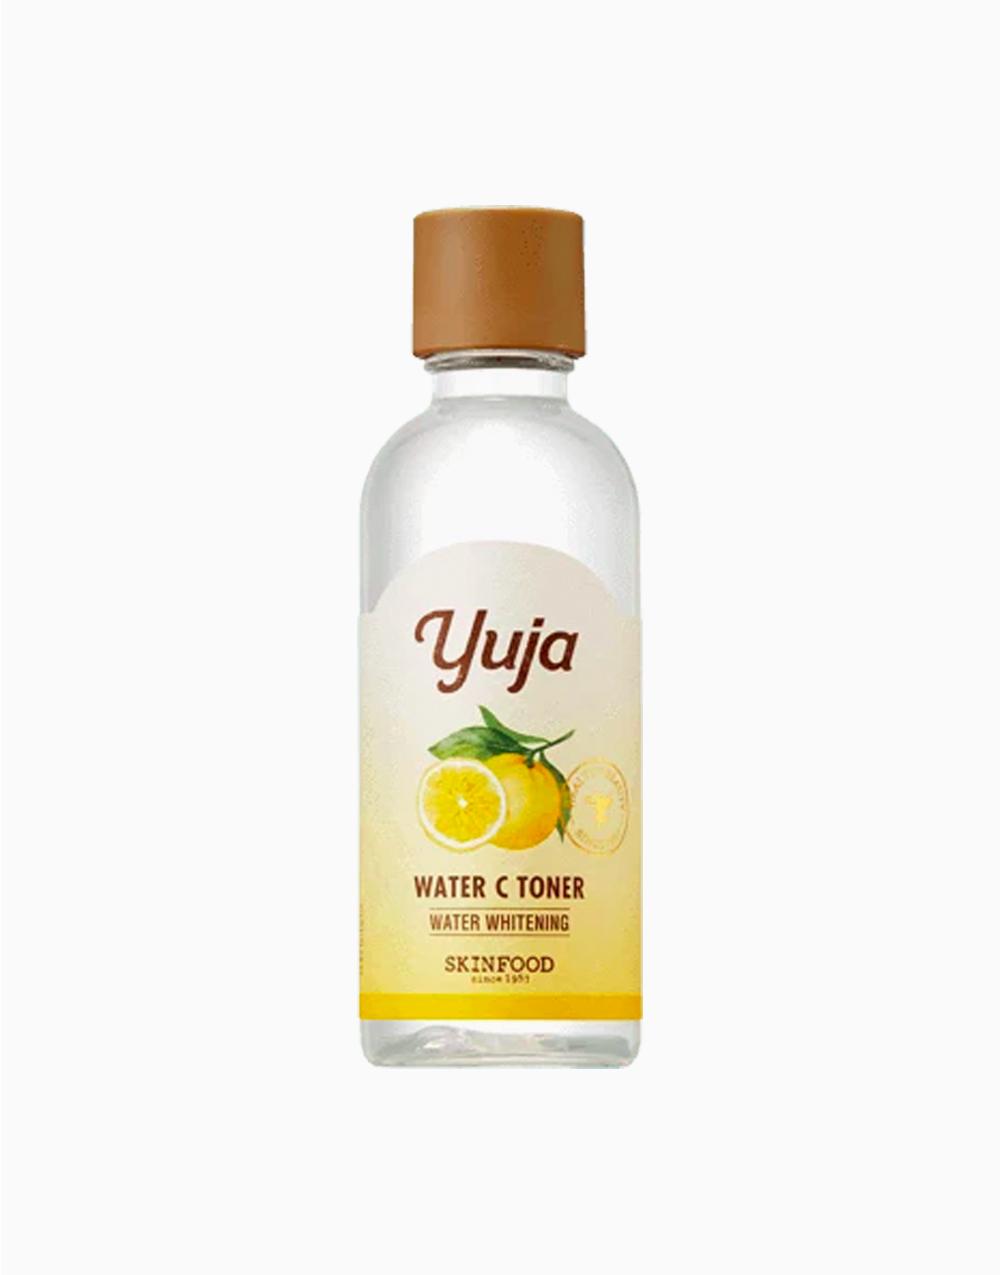 Yuja Water C Toner by Skinfood